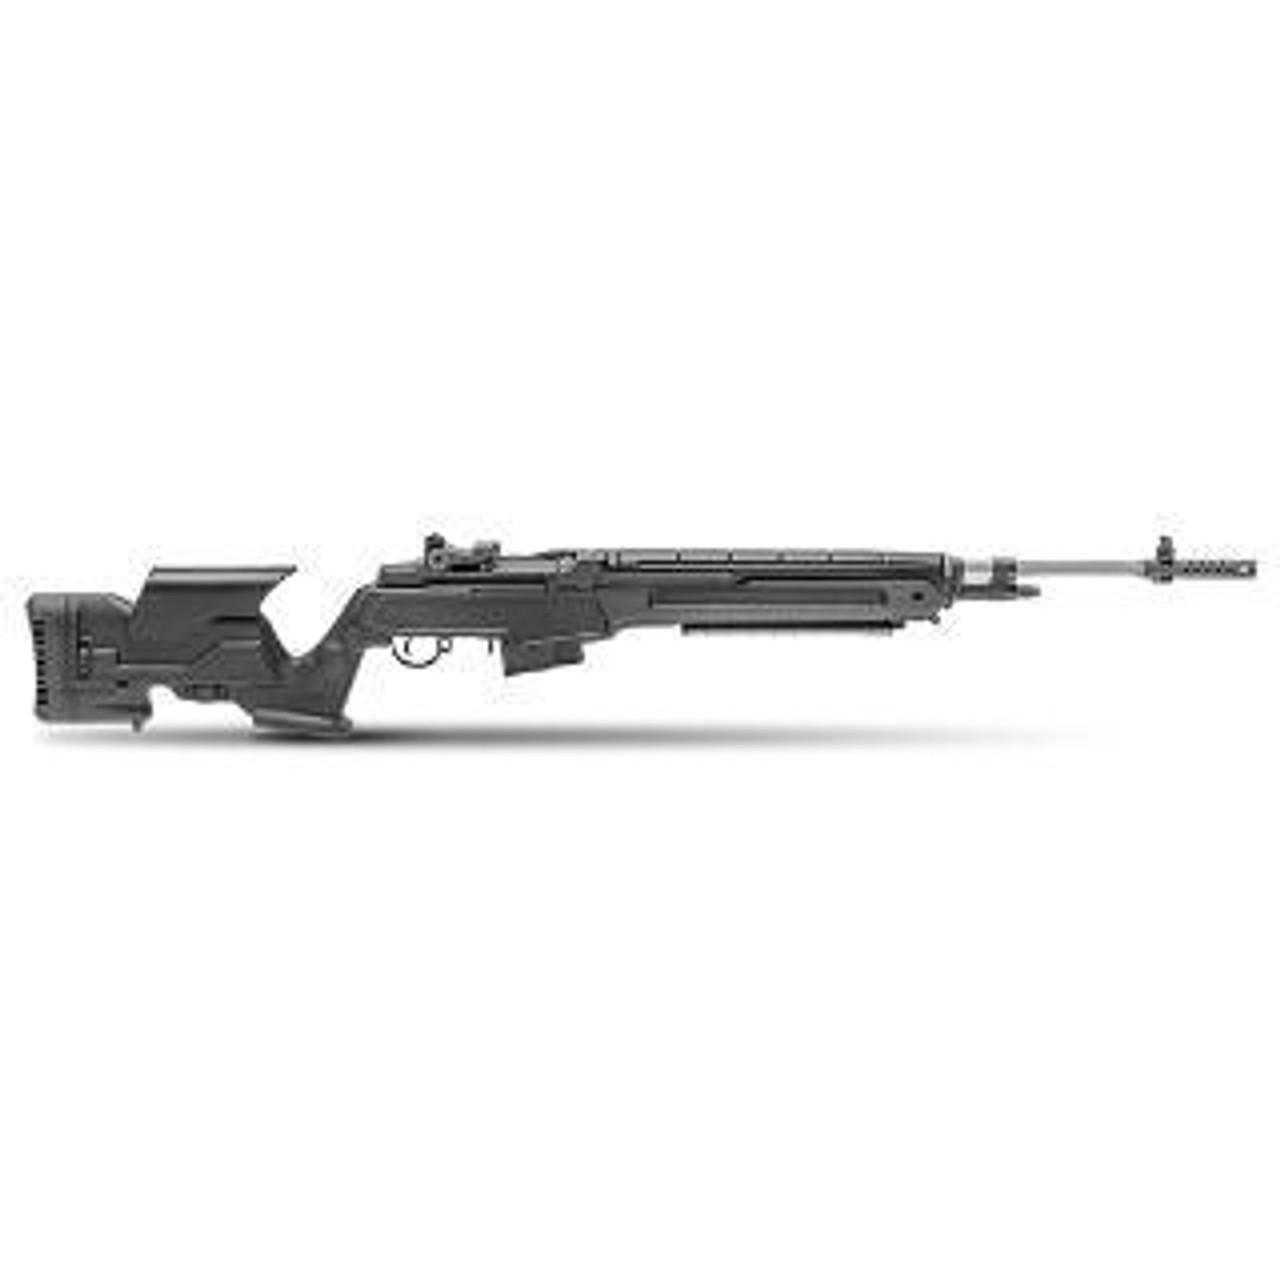 Springfield Armory M1A-Precision Adjustable Rifle-NM Barrel CALIFORNIA LEGAL- 6.5Creedmoor-Black